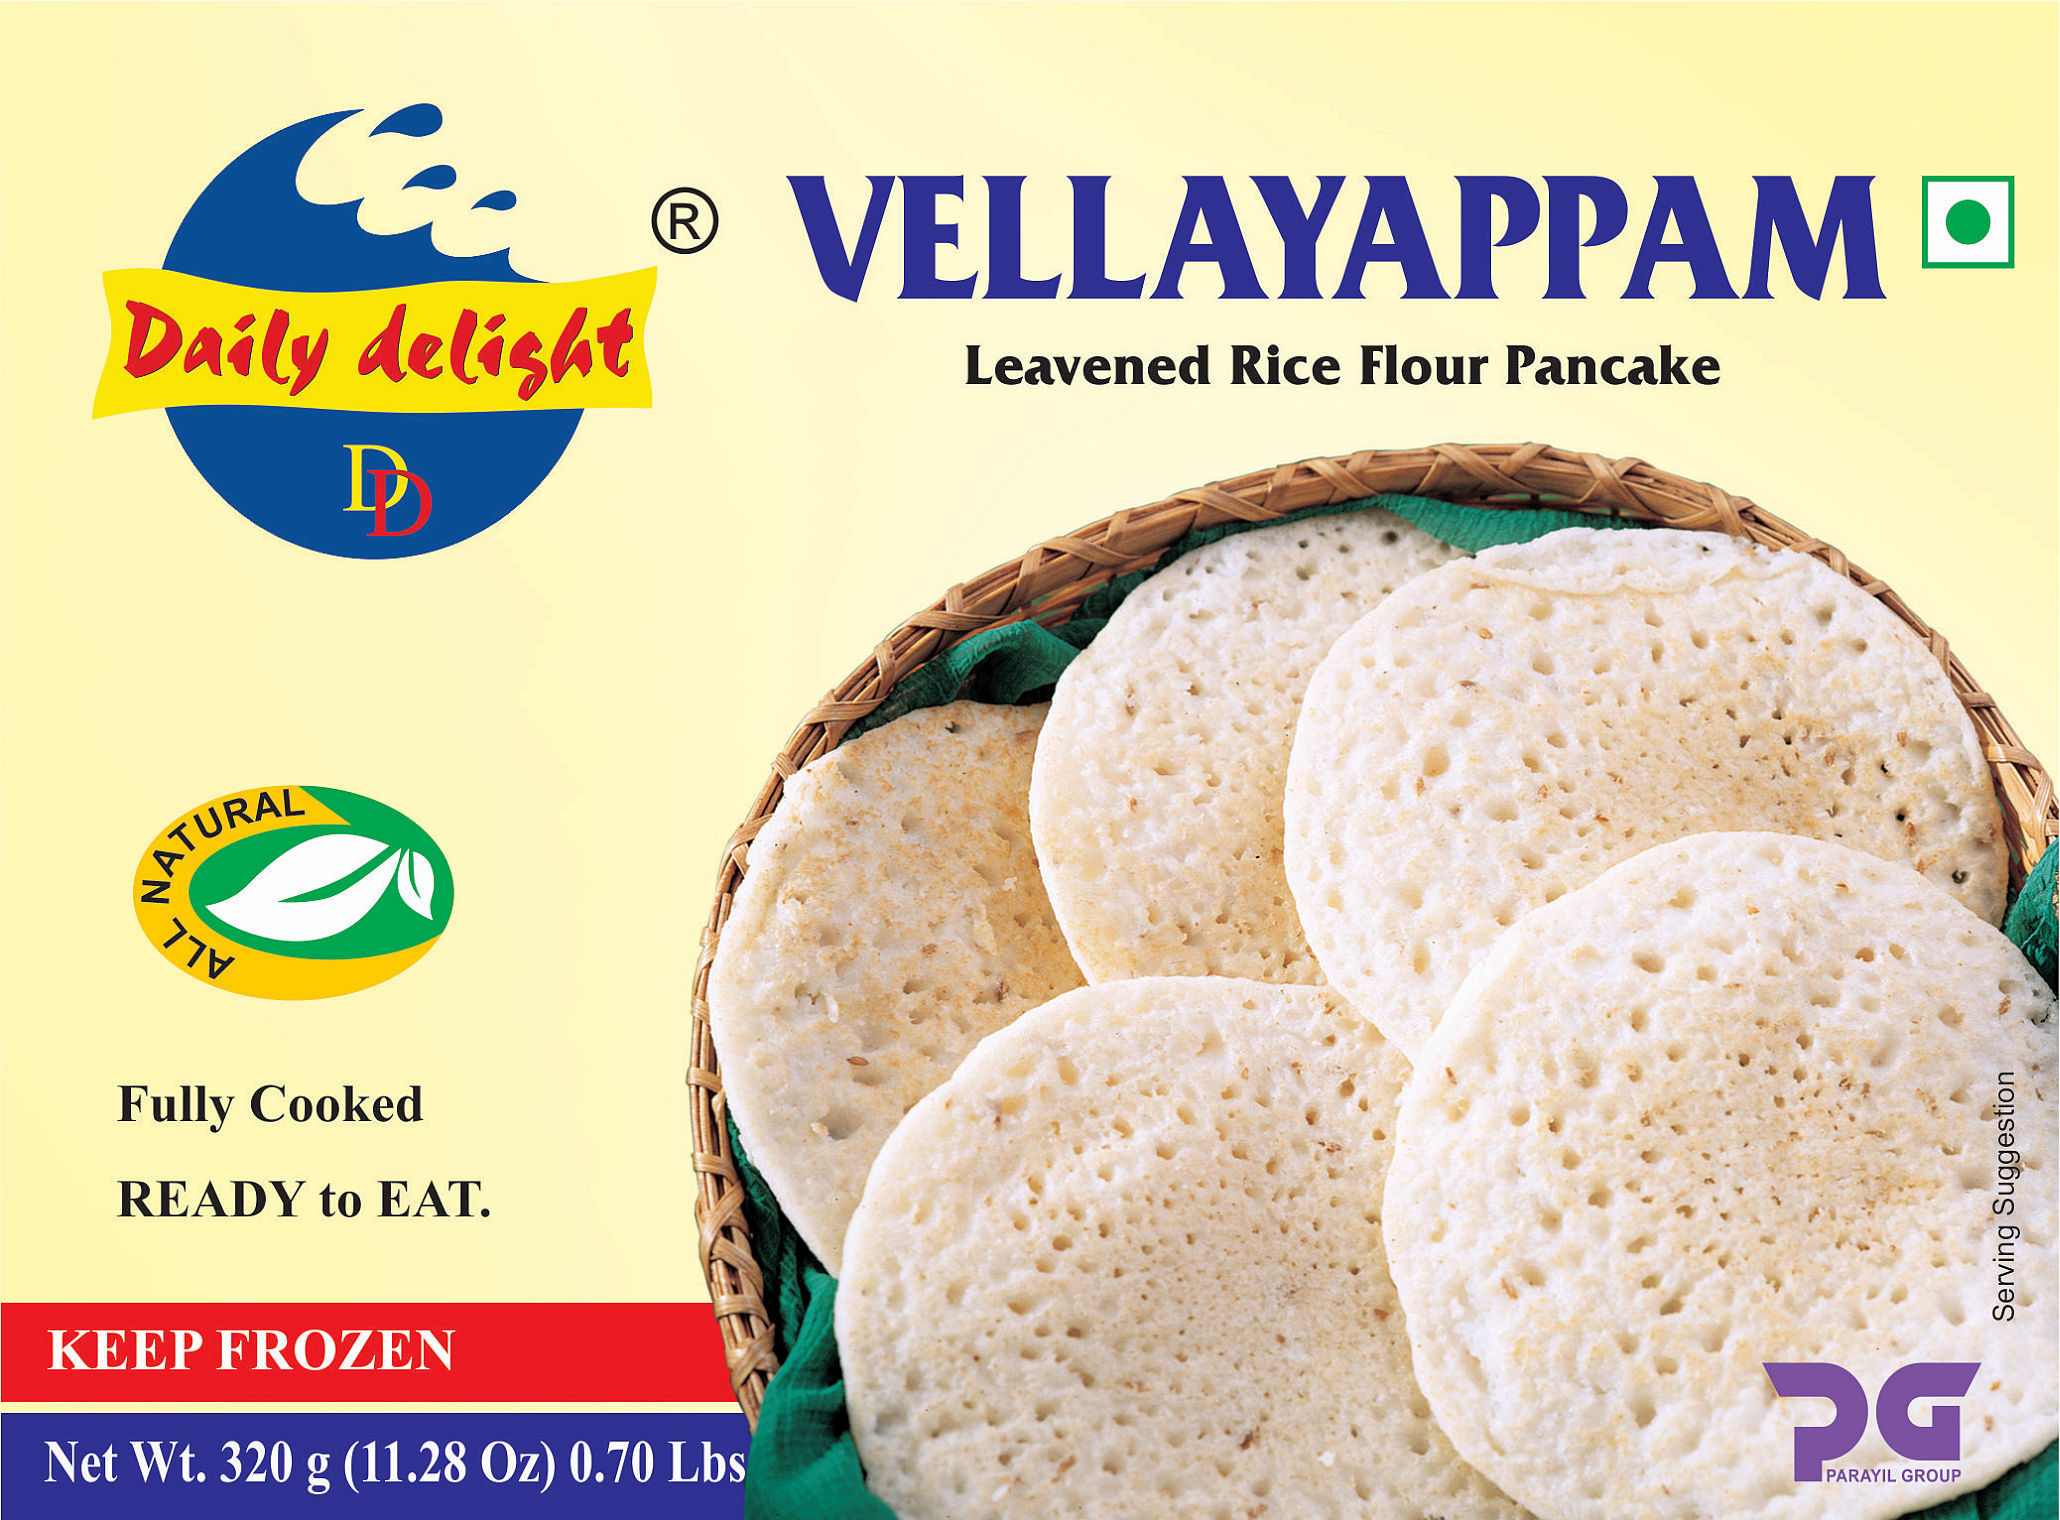 Daily Delight Vellayappam